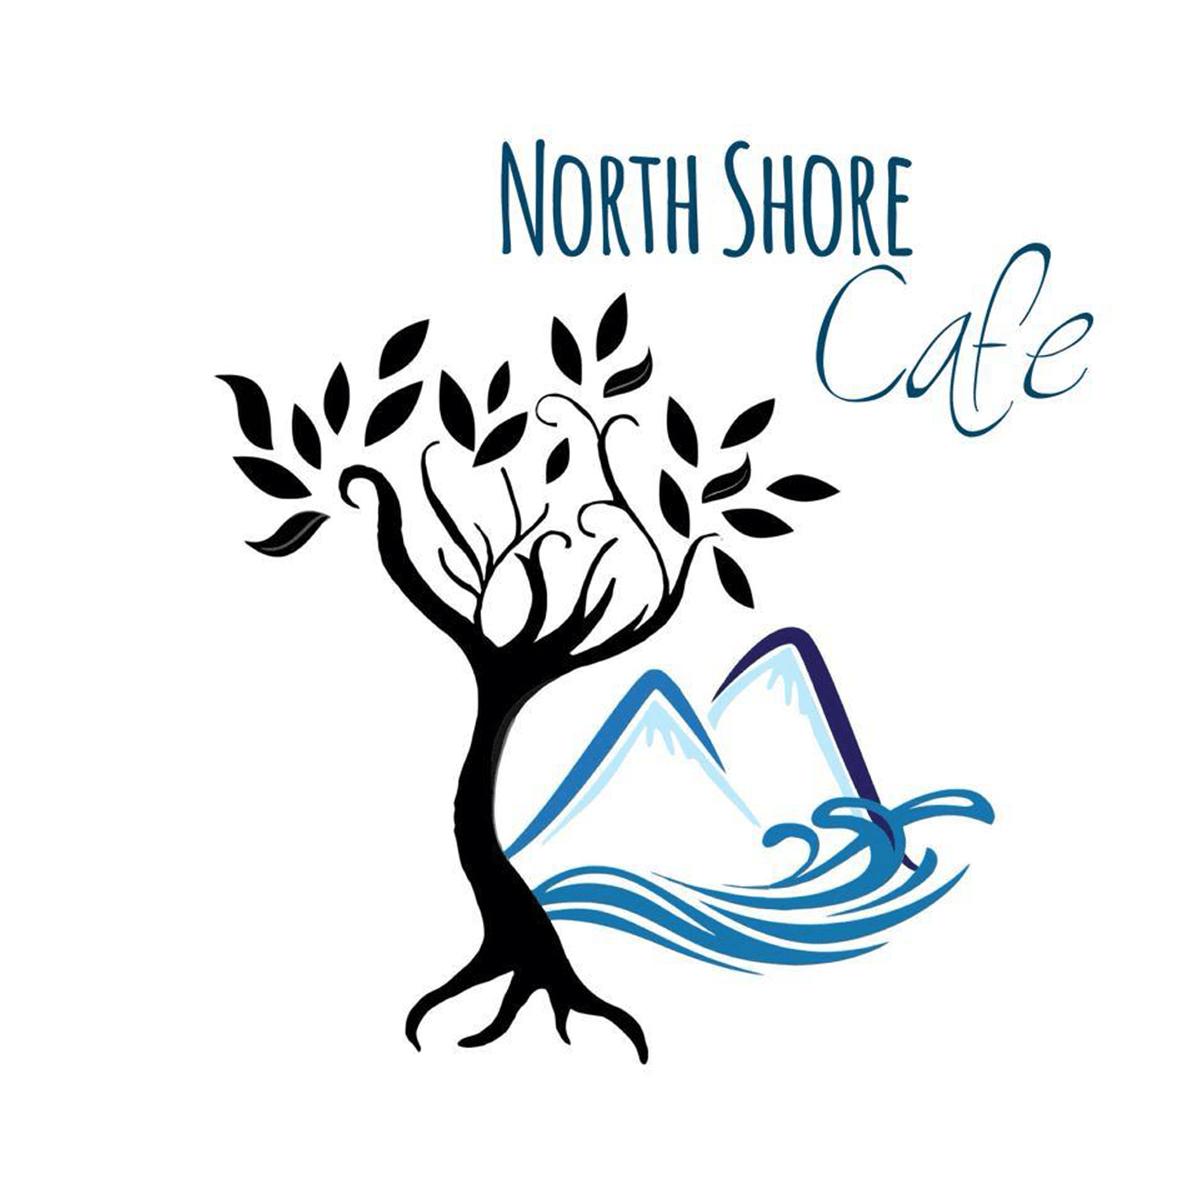 North Shore Cafe logo